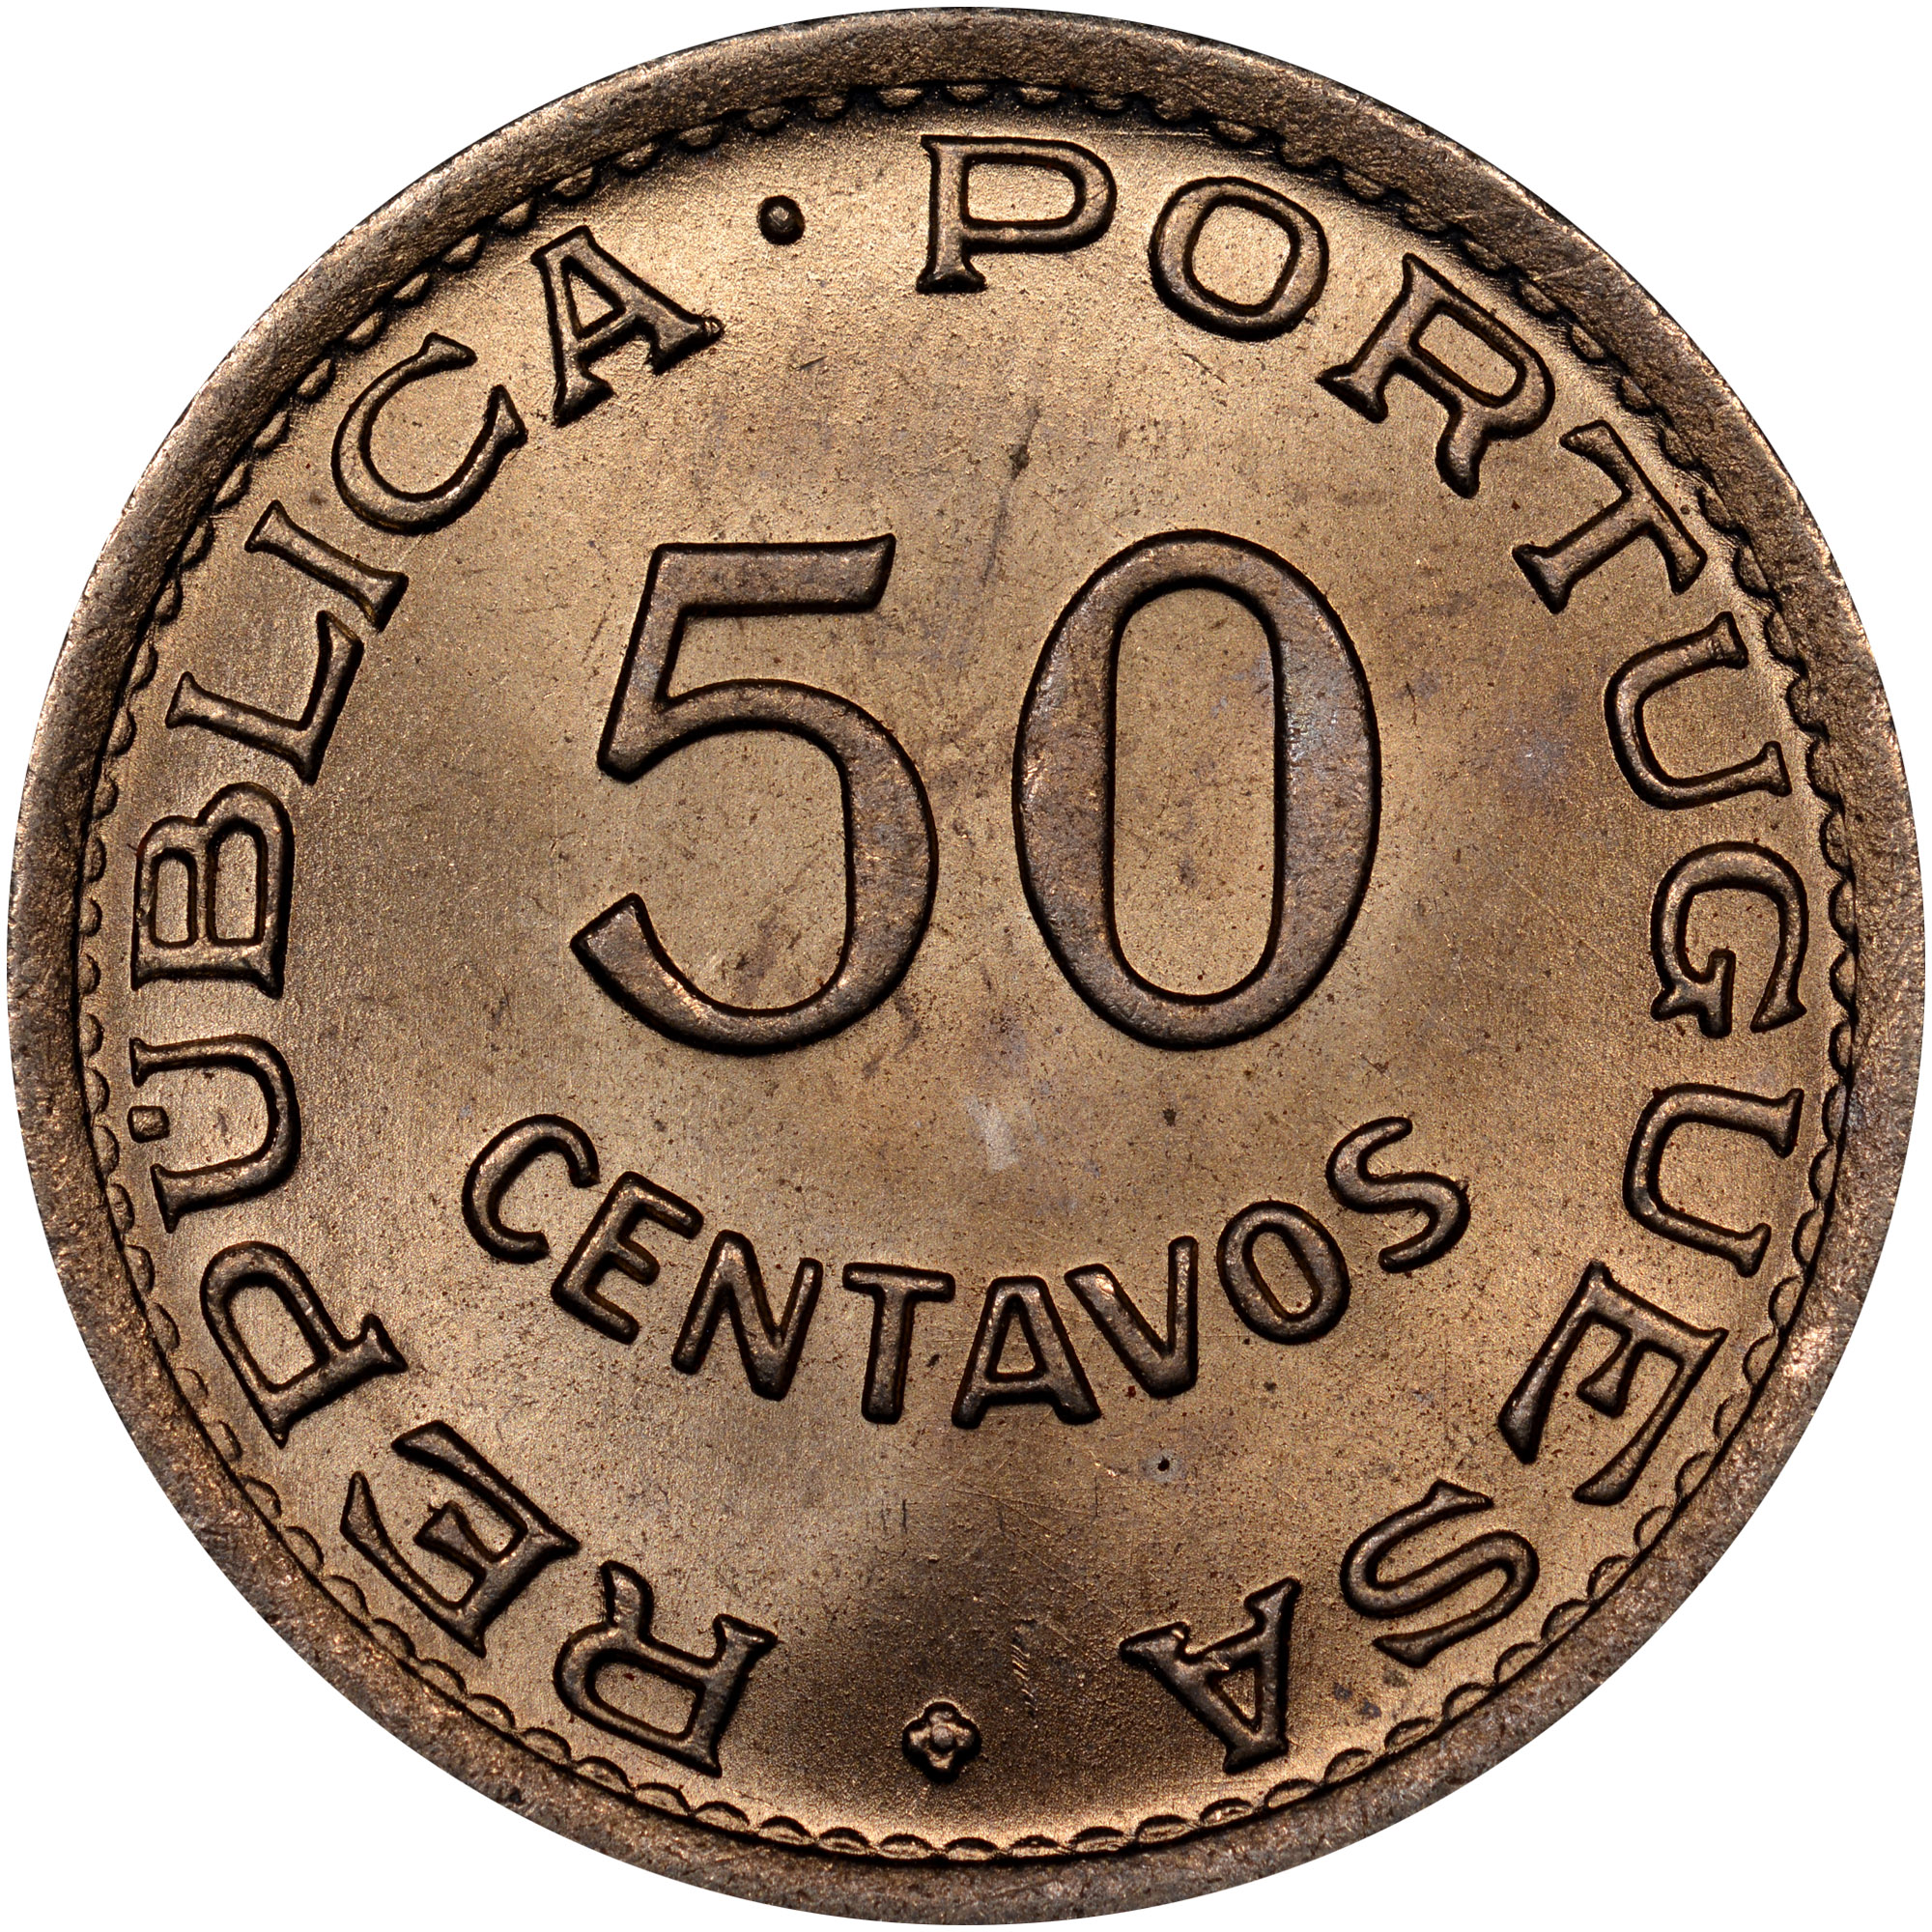 1948-1950 Angola 50 Centavos obverse